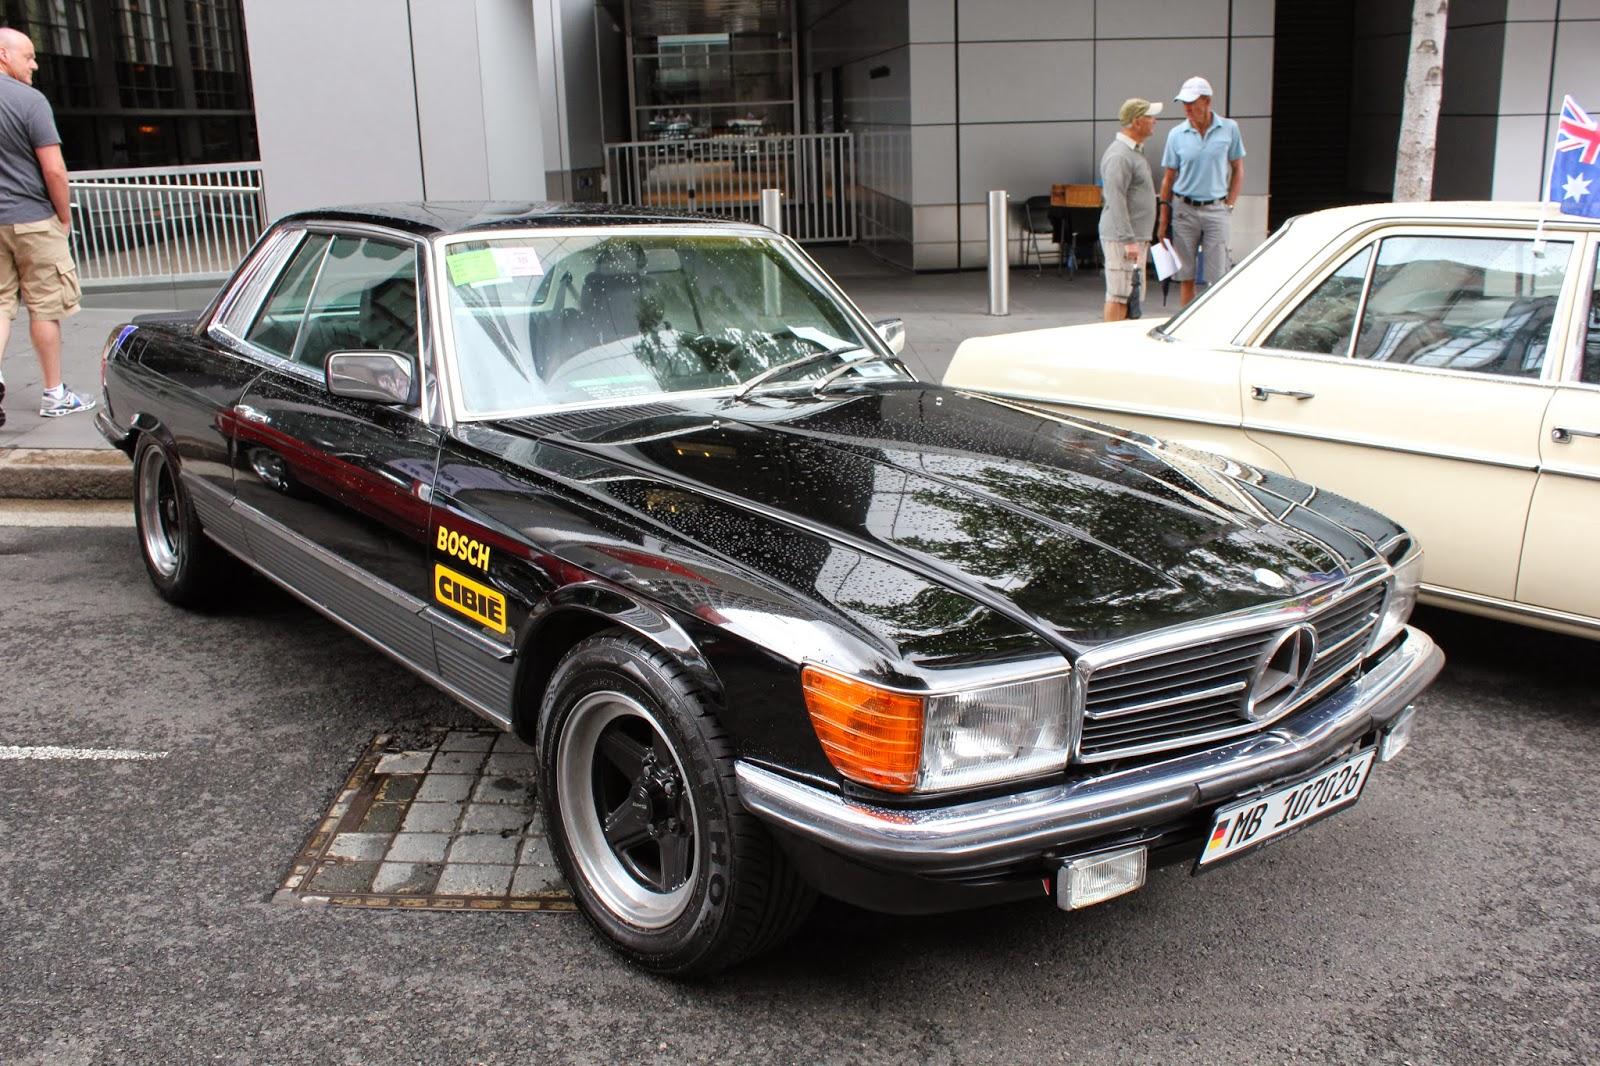 Aussie old parked cars 1981 mercedes benz c107 500 slc for Mercedes benz 1980